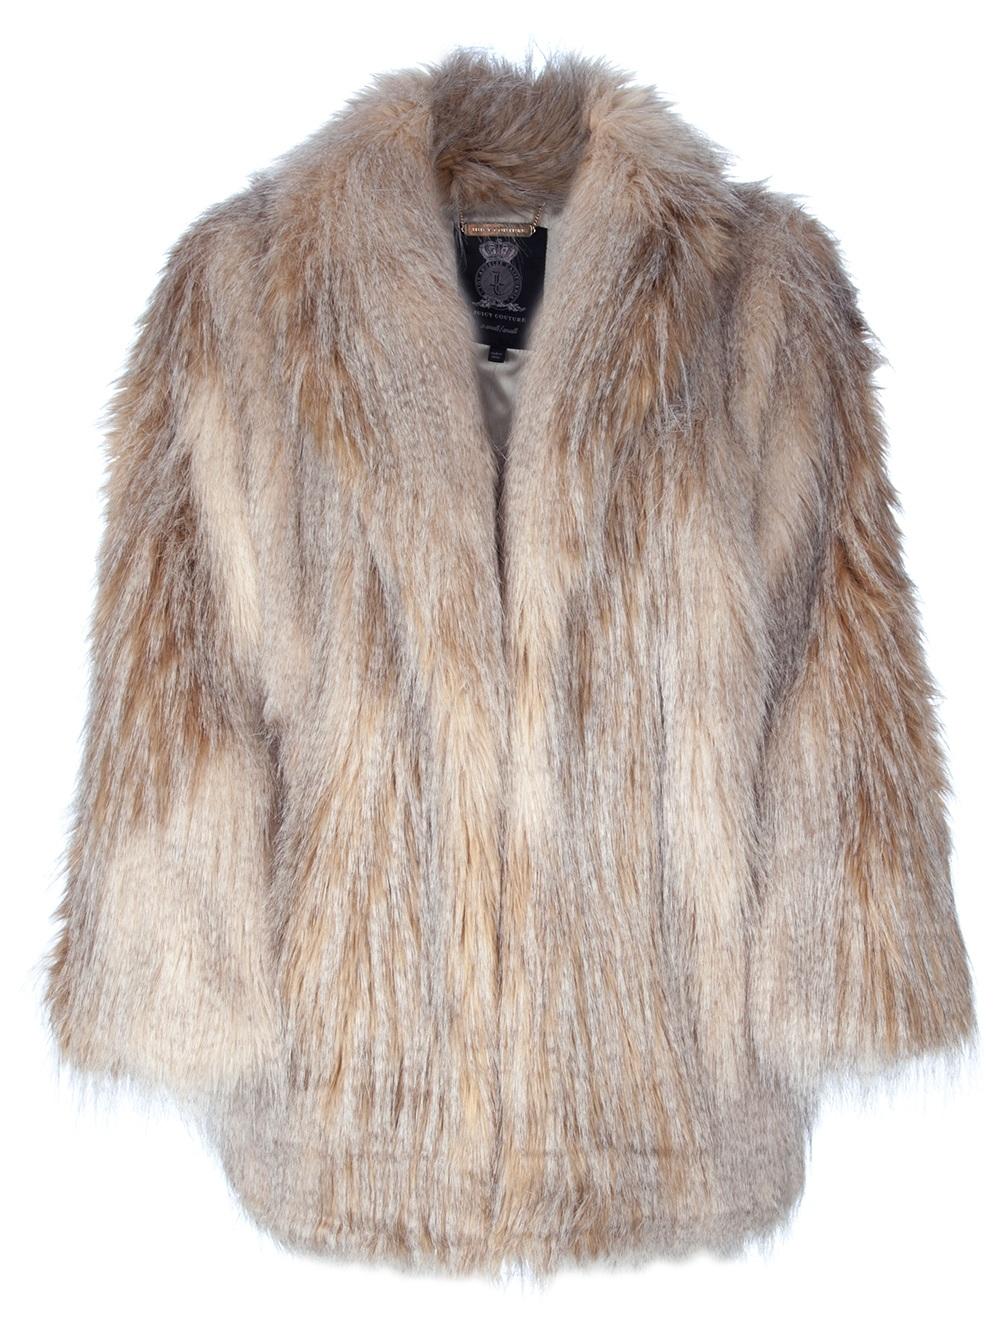 Images of Fake Fur Coats - Reikian